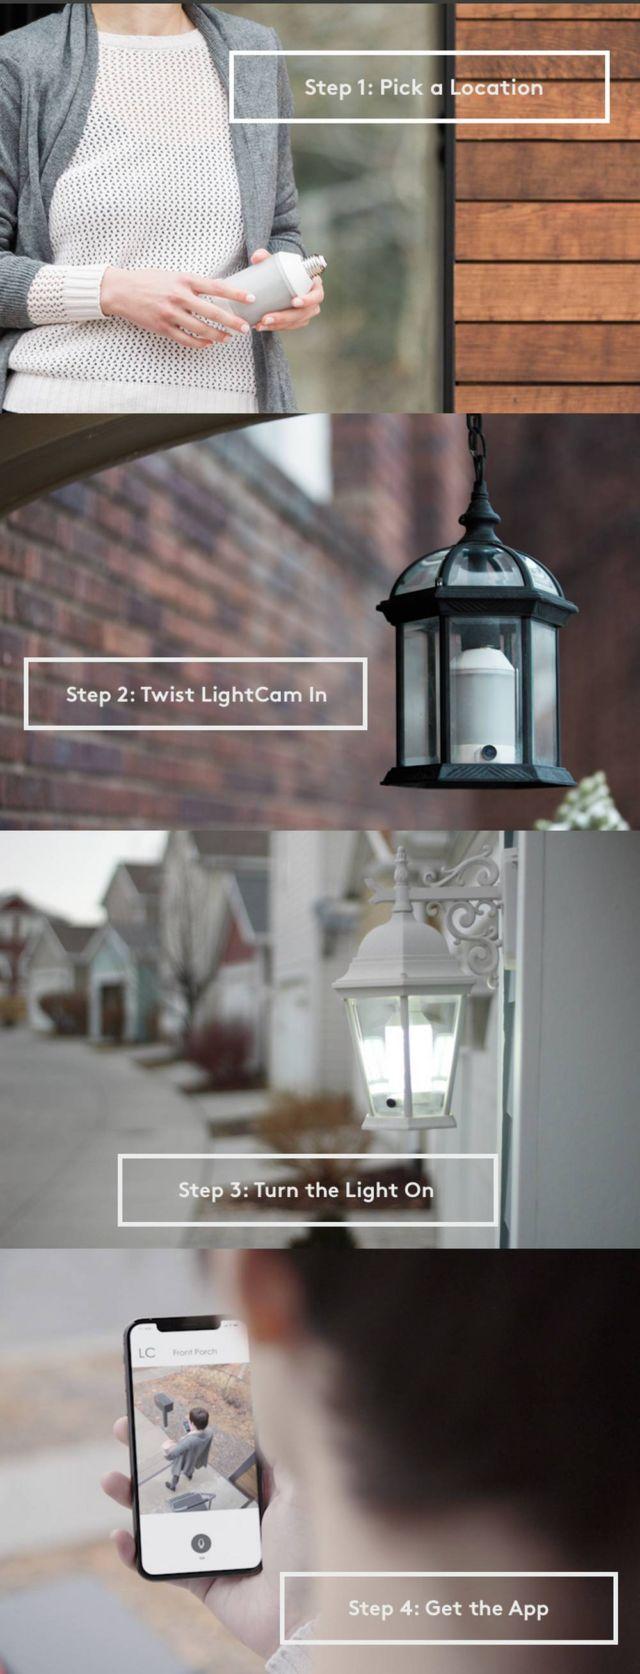 LightCam smart security camera (1)